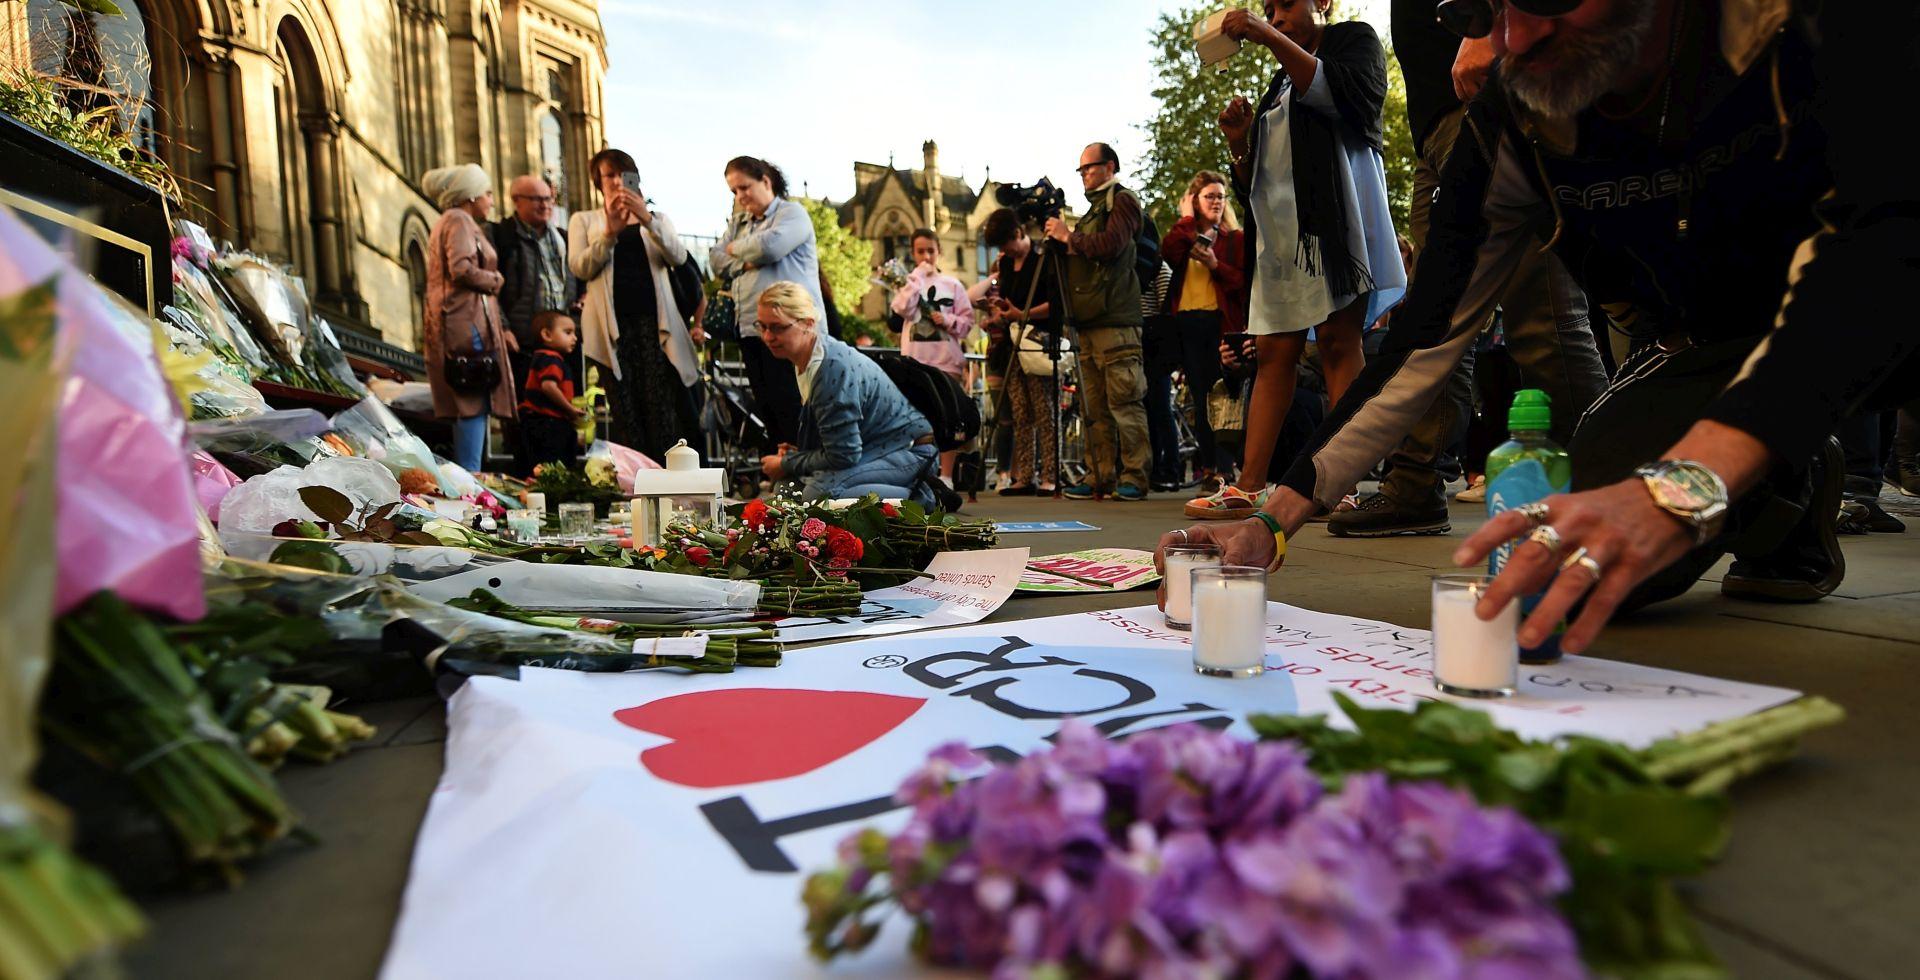 Manchester United i Manchester city donirat će milijun funti za žrtve napada